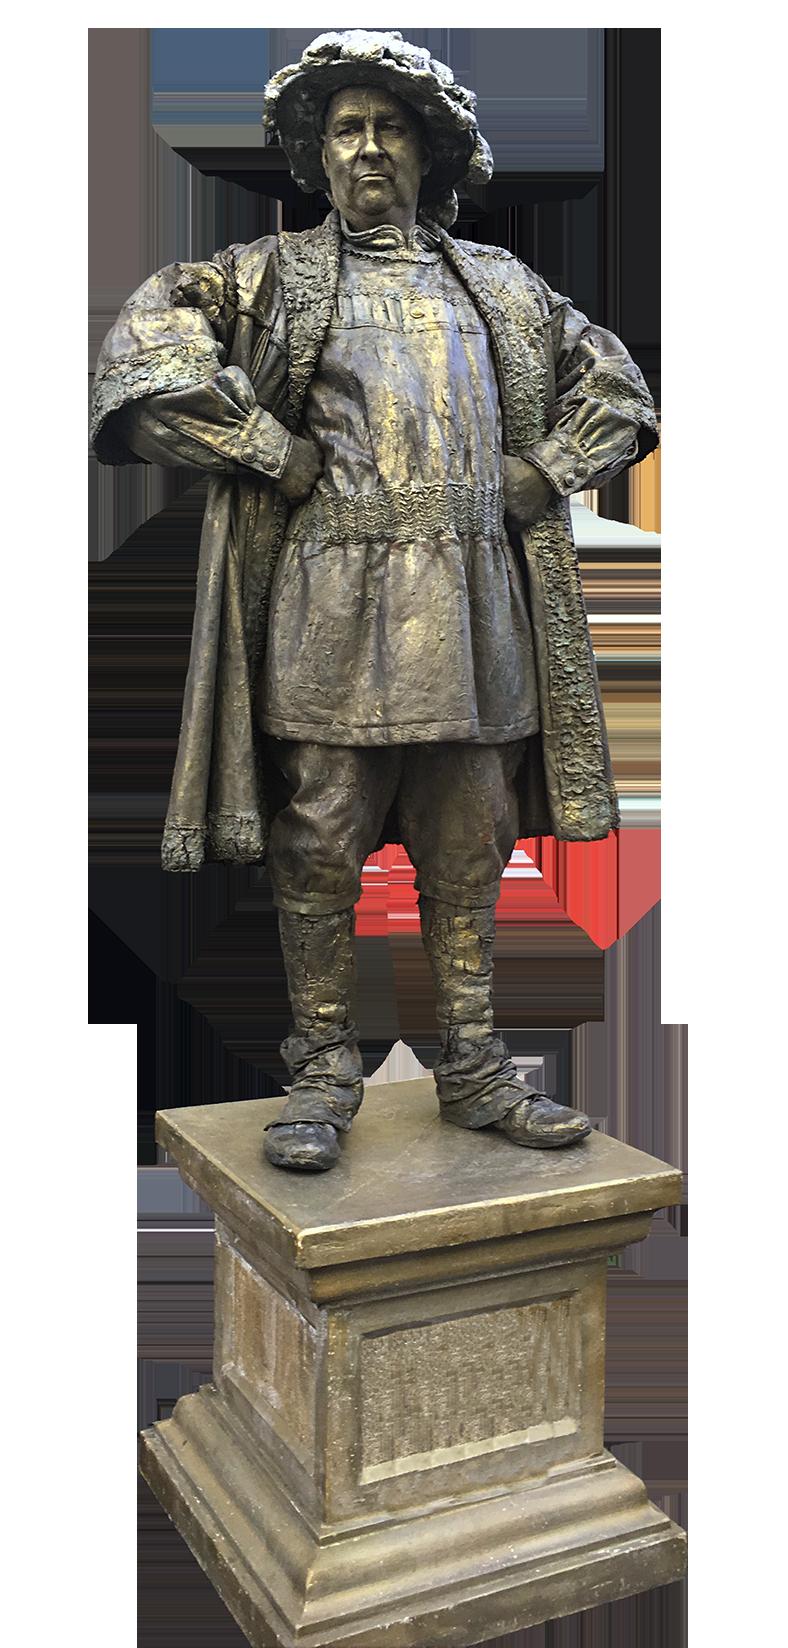 049 De Hertog - The Duke - Living Statue - Levend Standbeeld | 017 Animation - Animatie